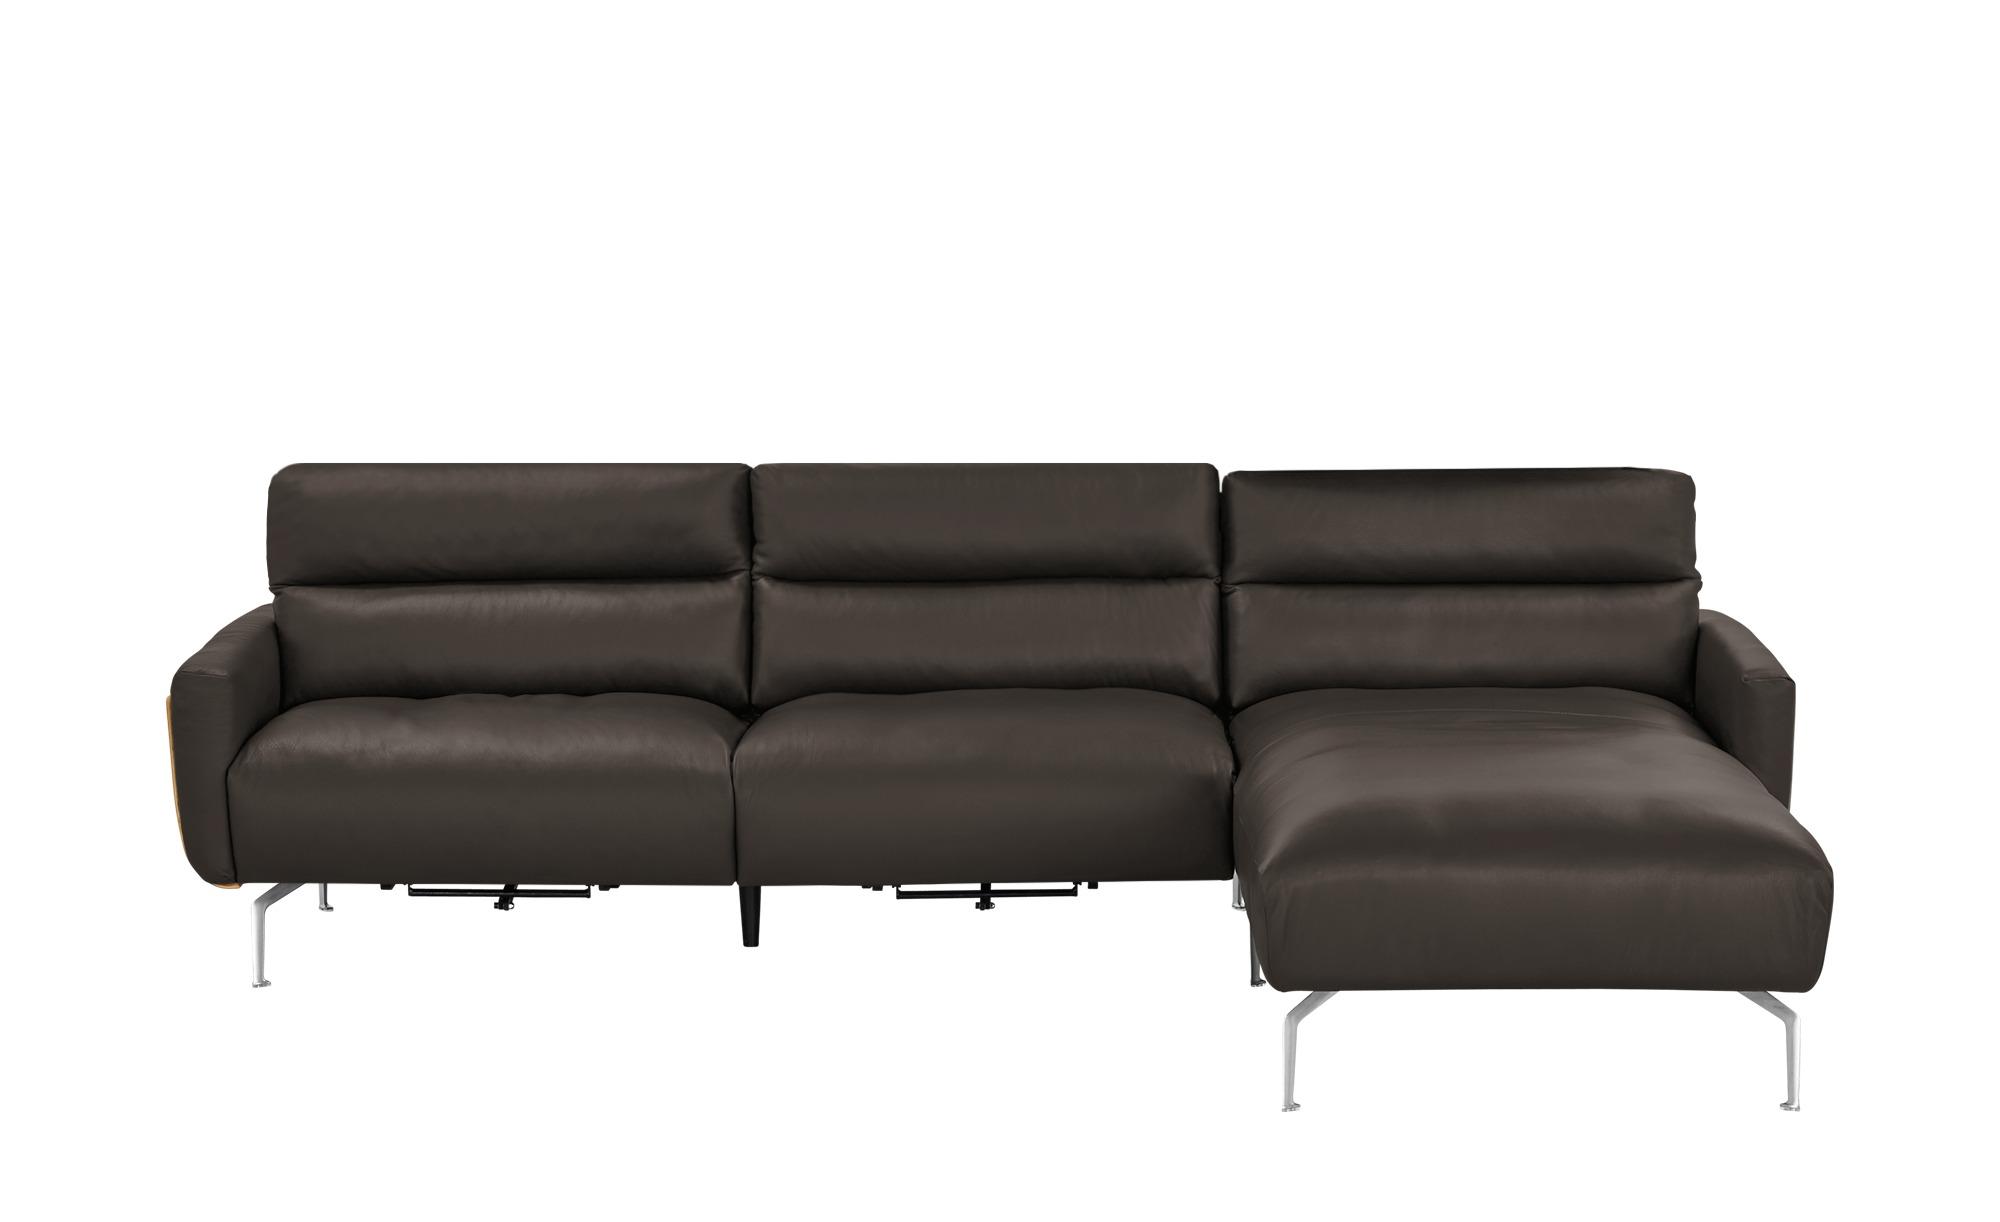 Ecksofa 2252 breite h he 90 cm braun online kaufen bei for Ecksofa breite 200 cm